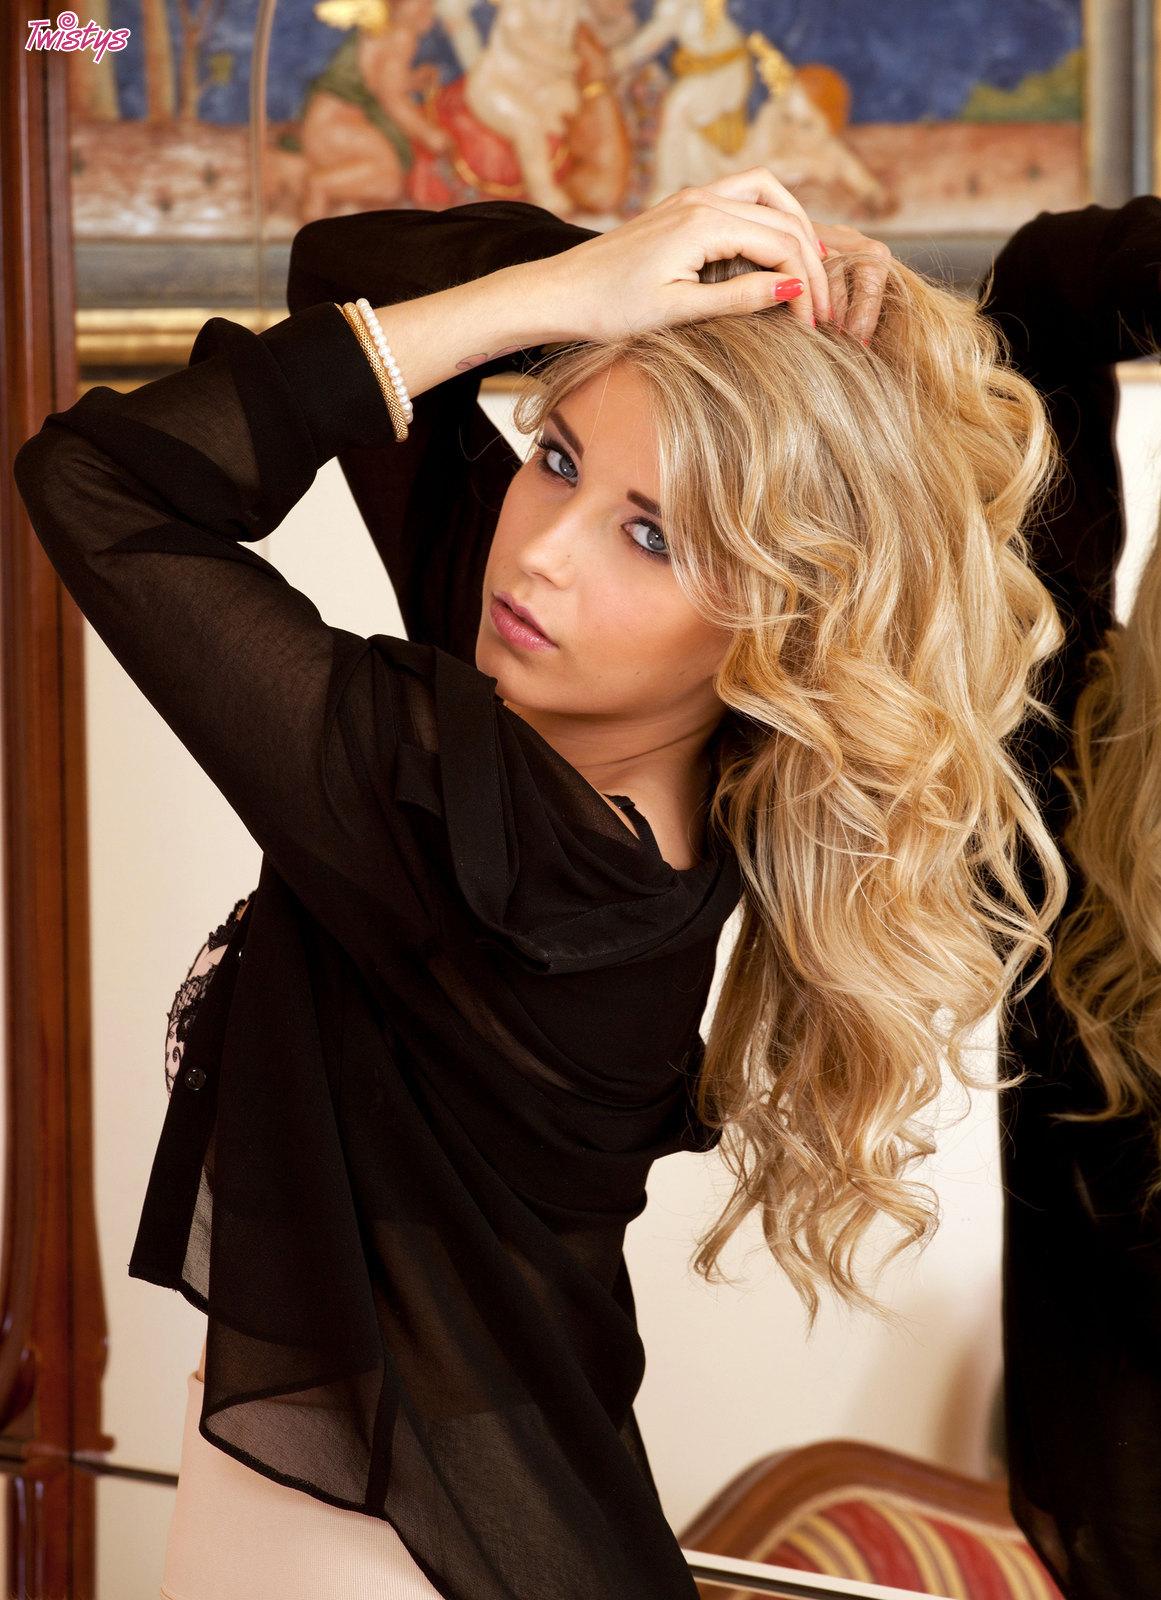 Blonde Buxom.. featuring Jodie Piper | Twistys.com